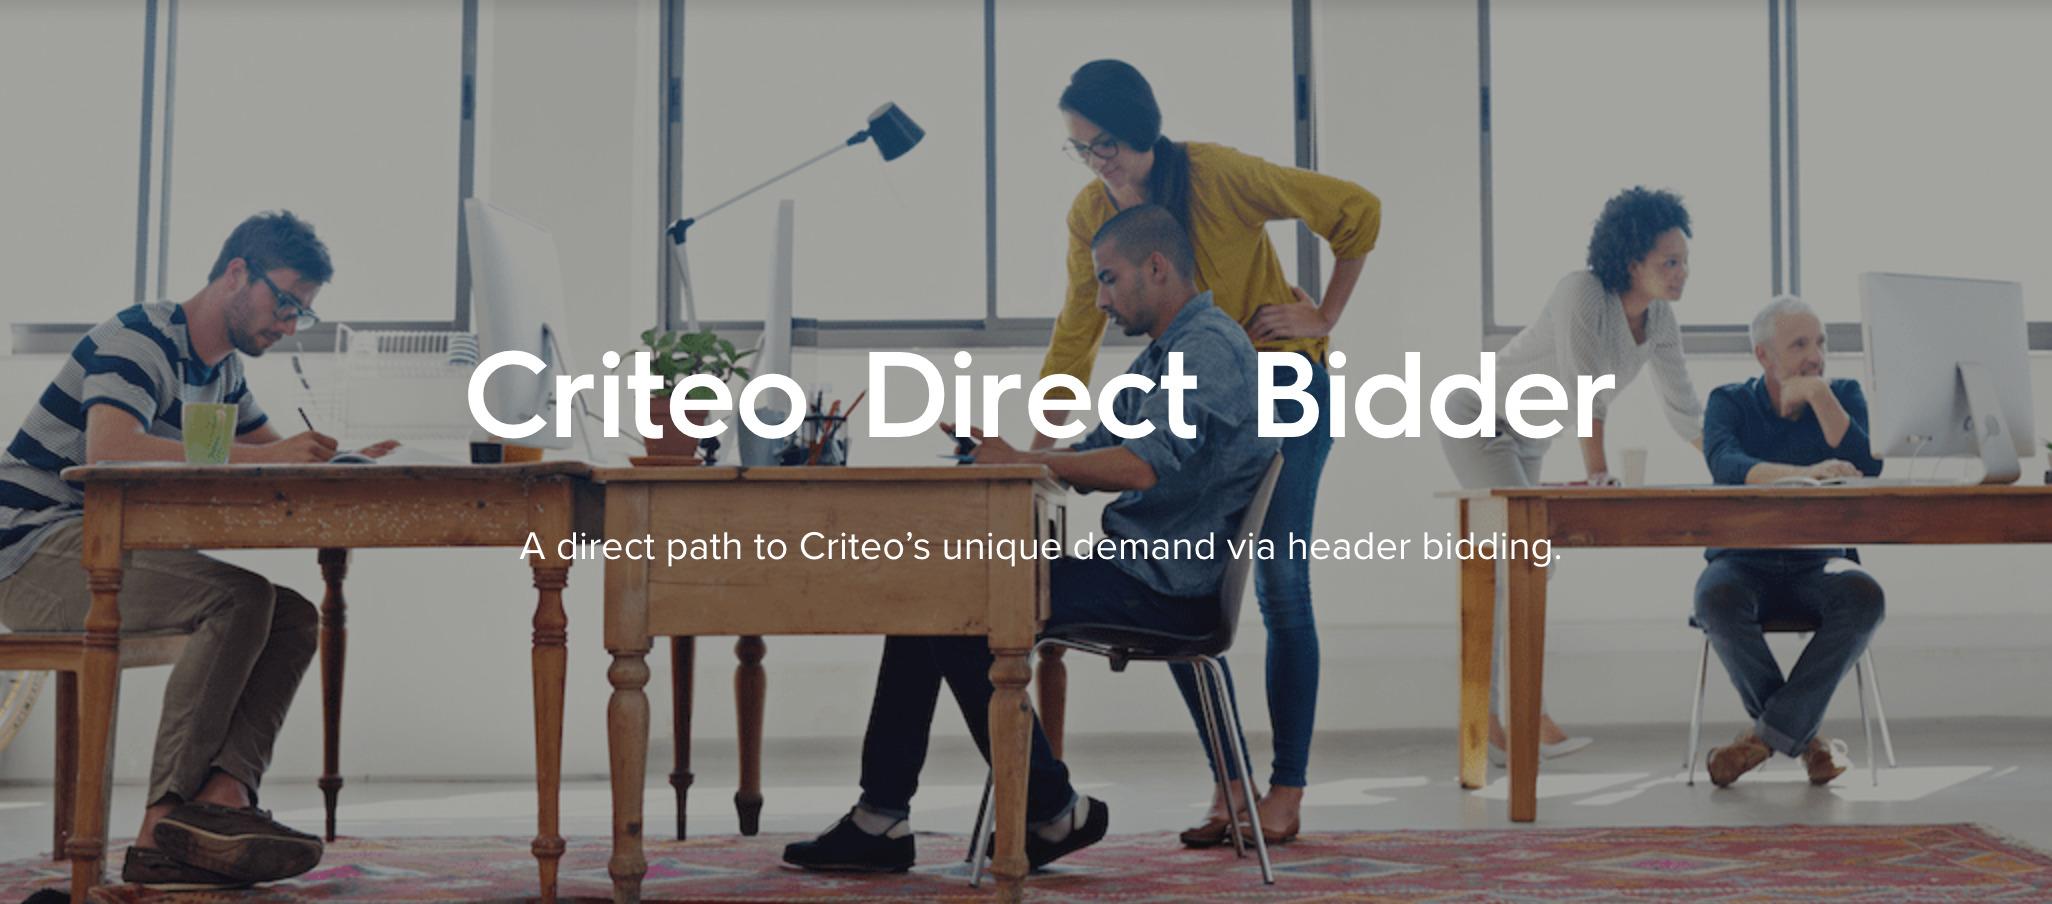 criteodirectbidder